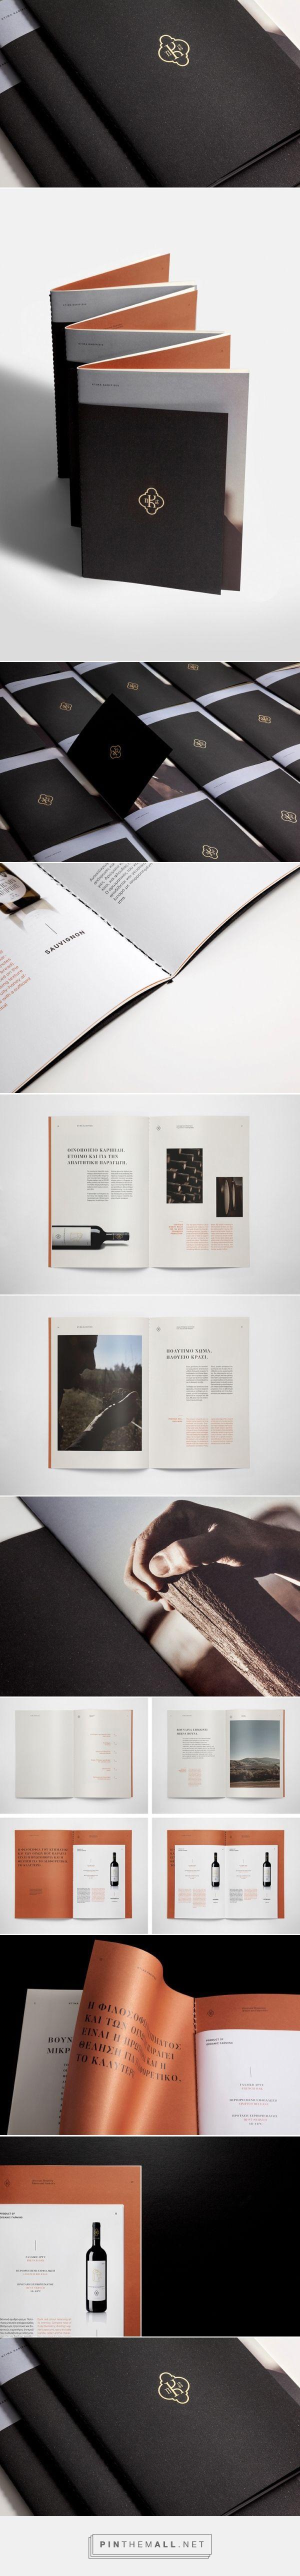 FPO: Karipidis Winery Brochure - created via https://pinthemall.net